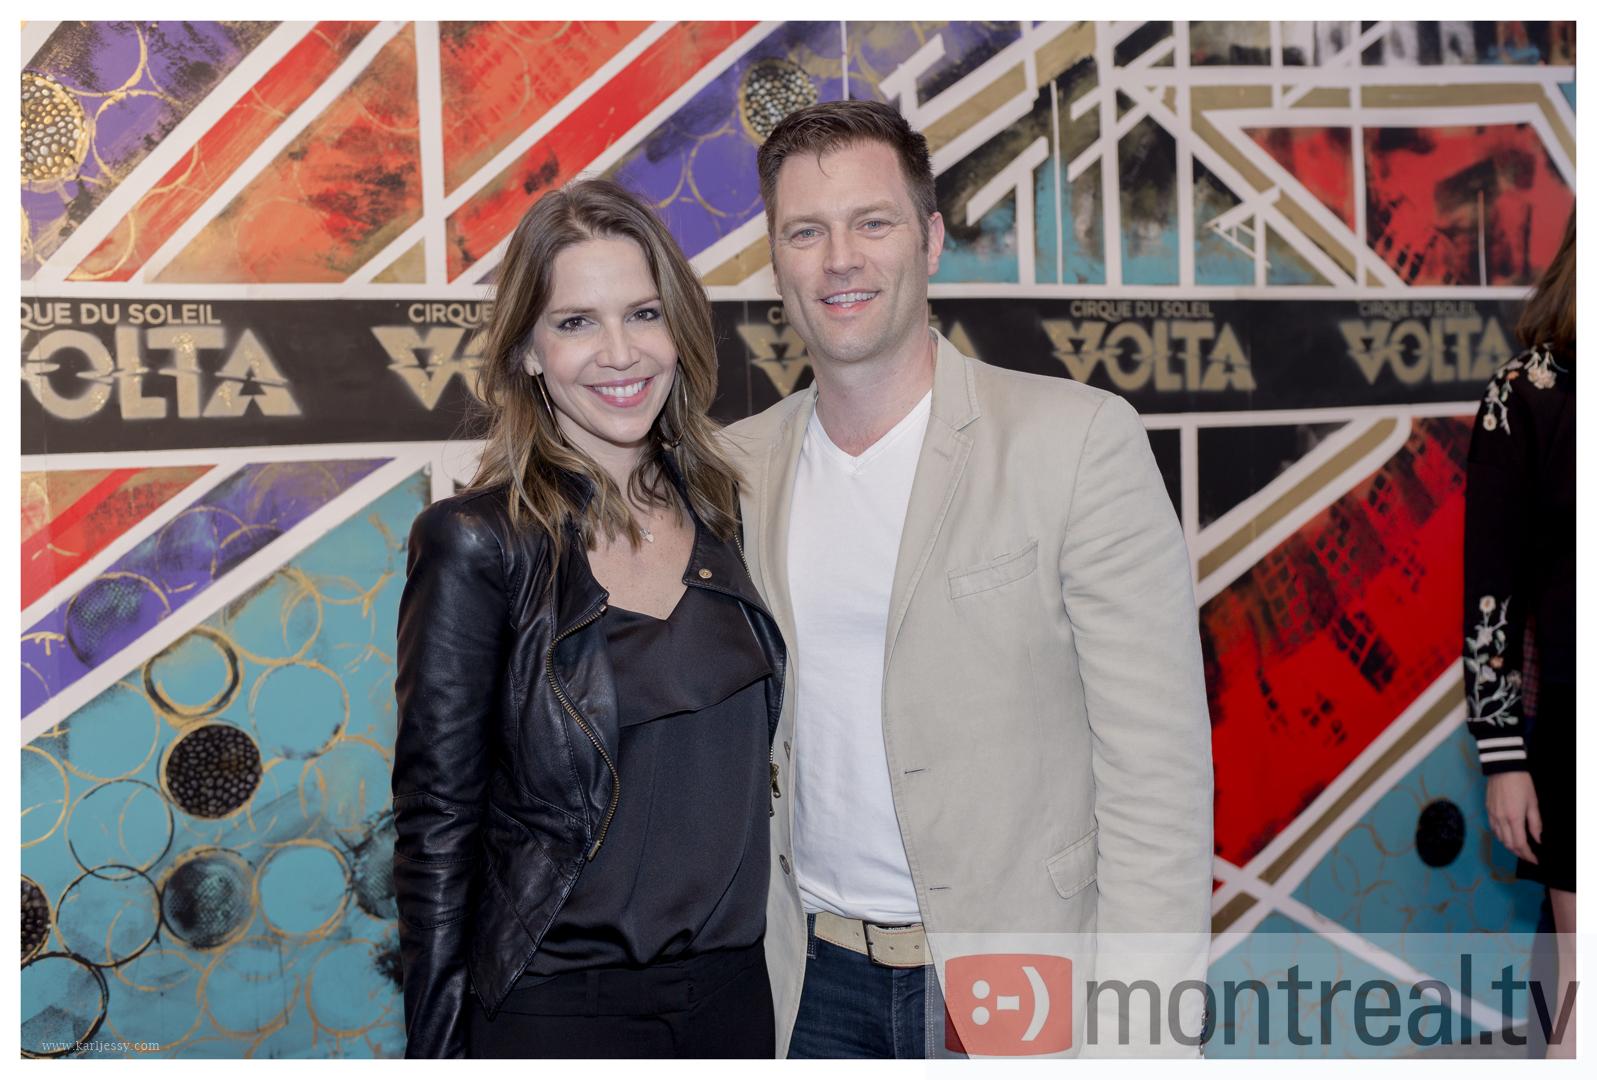 VOLTA_RedCarpet_MontrealTV0031